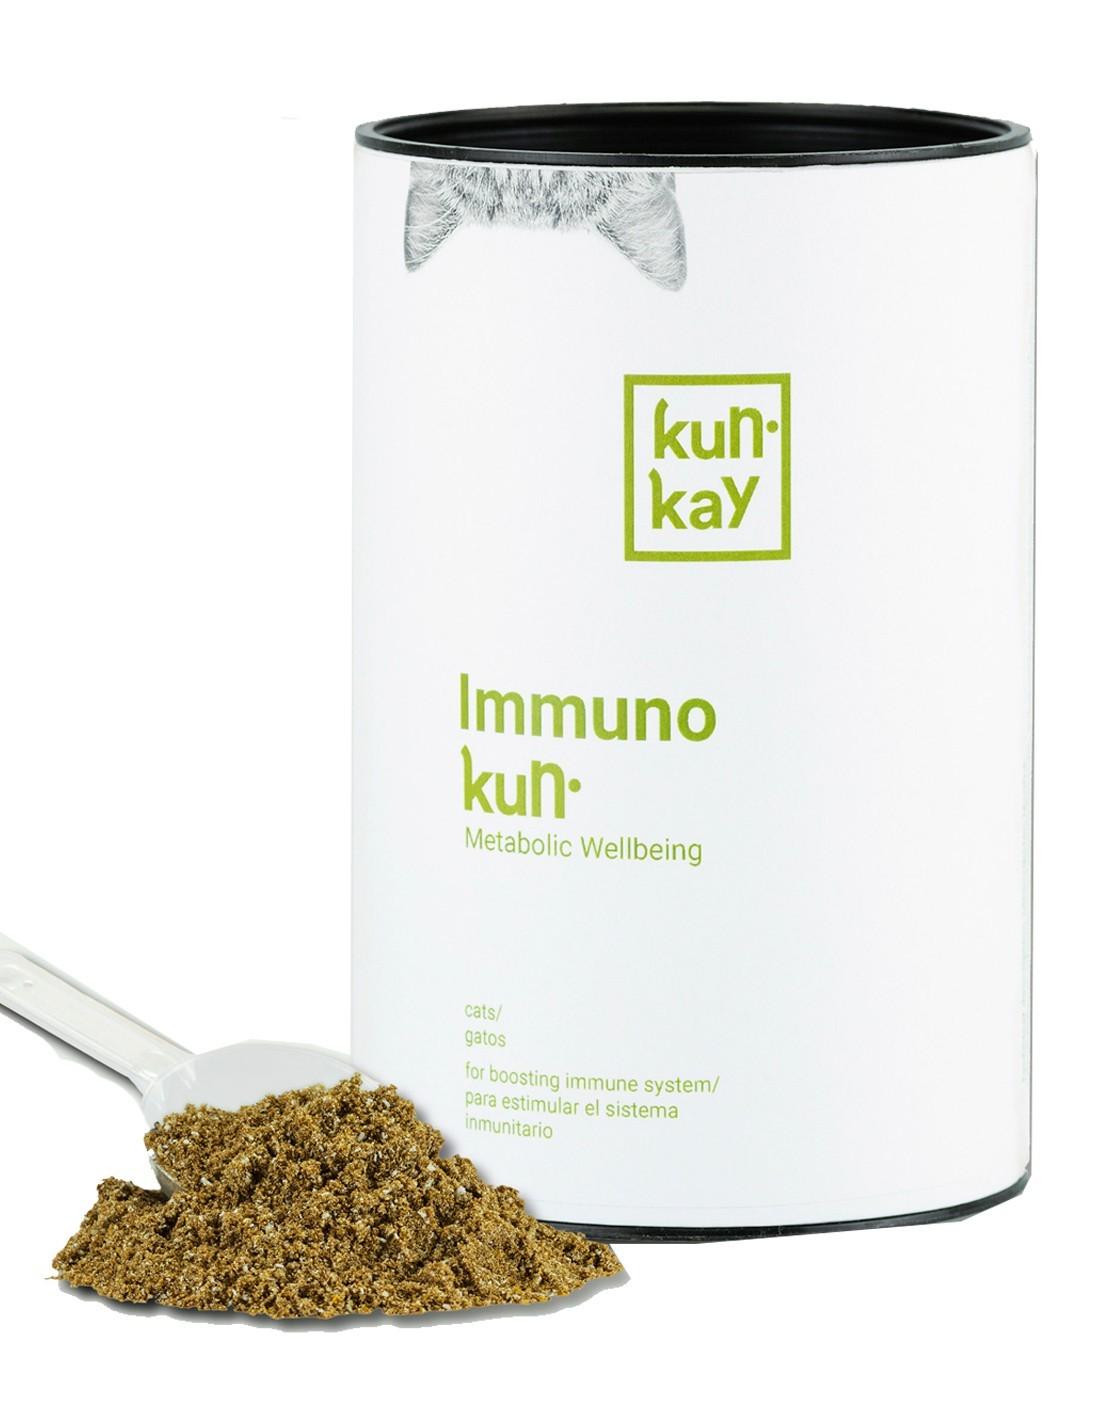 Kunkay Immunokun para estimular el sistema inmunitario 220g